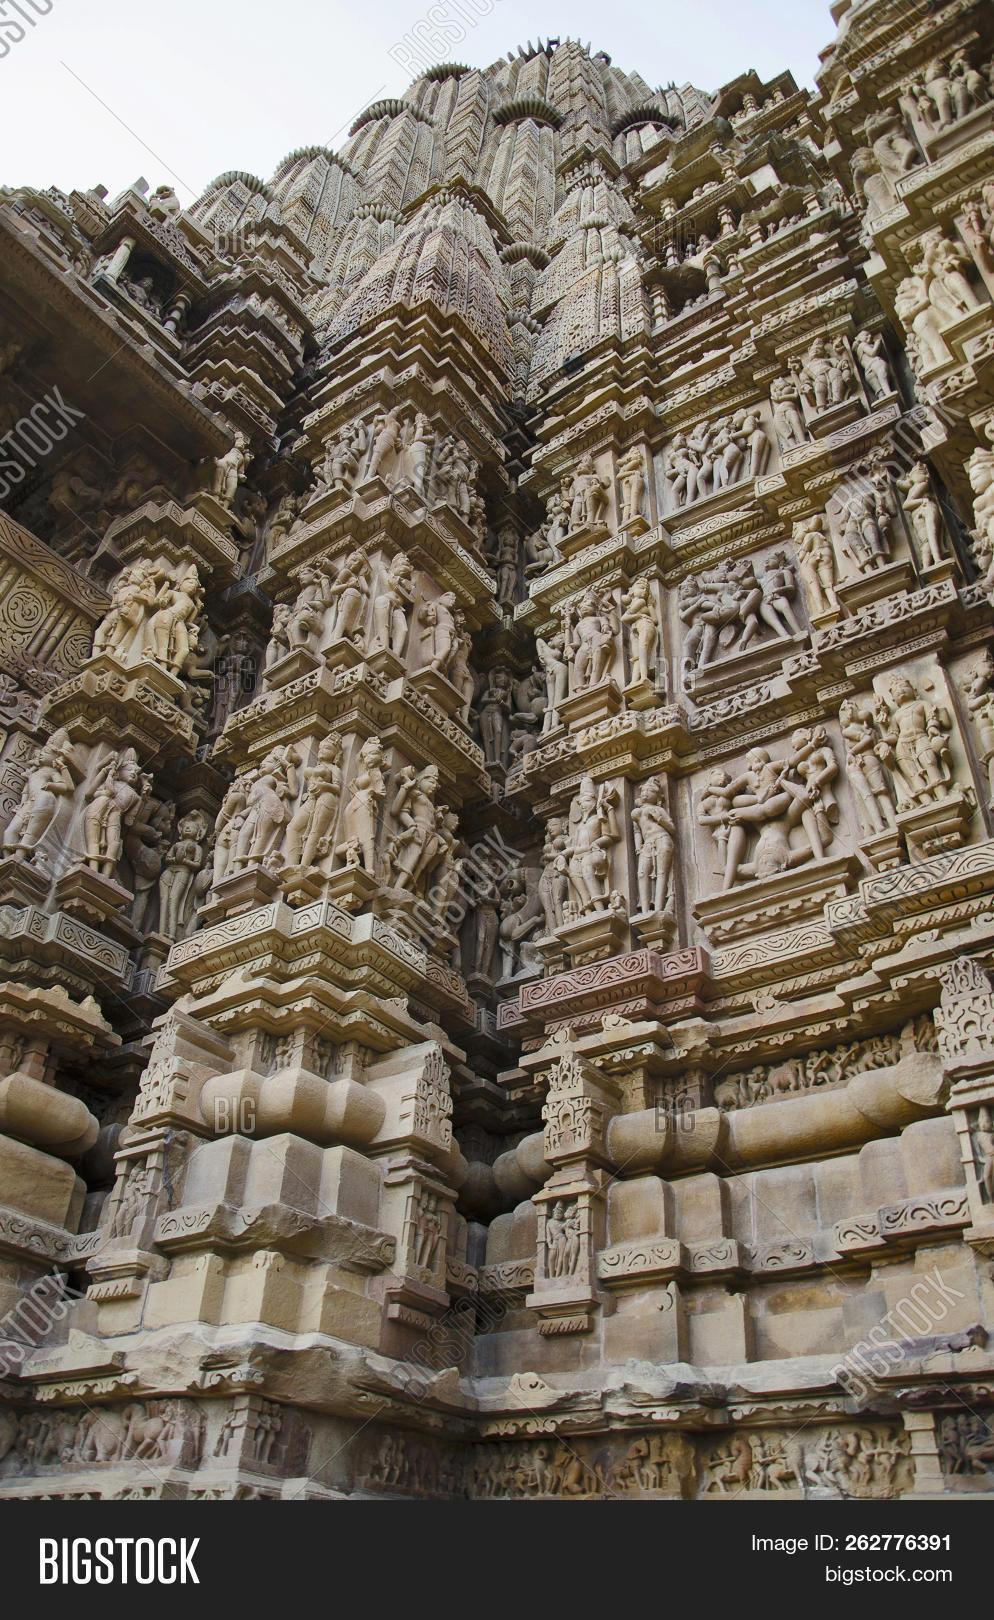 Lakshmana Temple, Image & Photo (Free Trial) | Bigstock